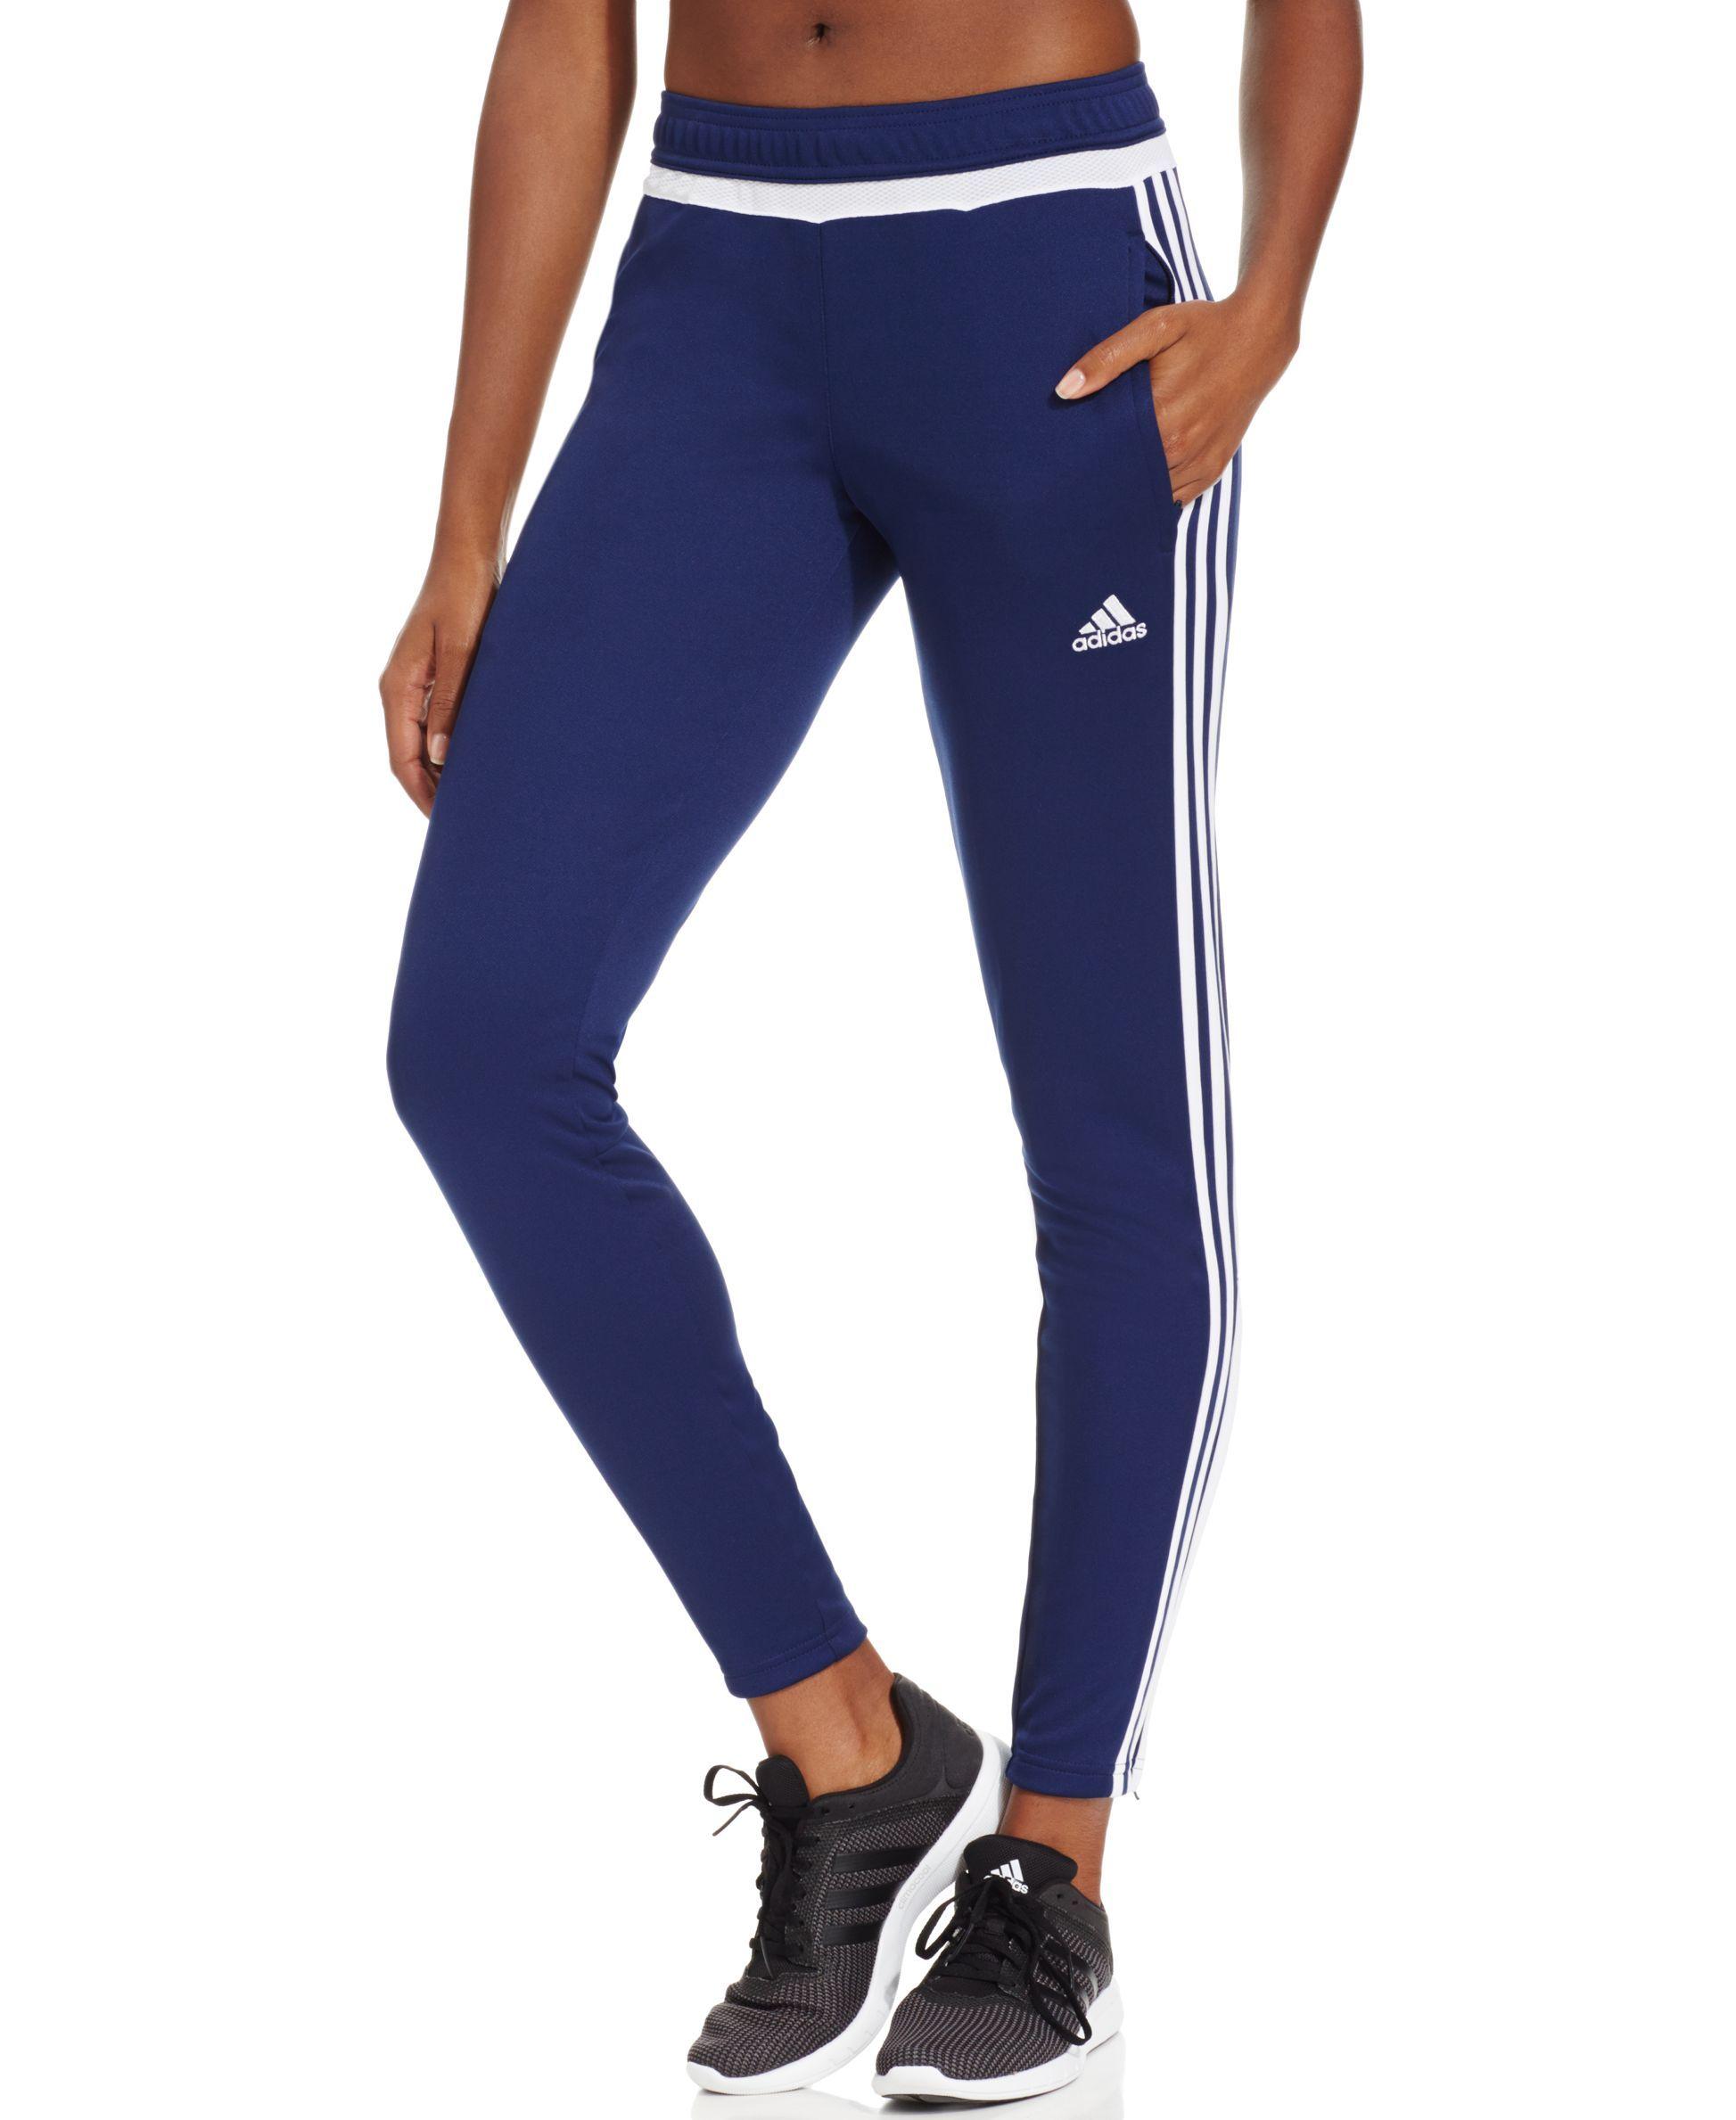 f29563fdb33 Adidas Tiro 15 ClimaCool® Training Pants - Activewear - Women - Macy's